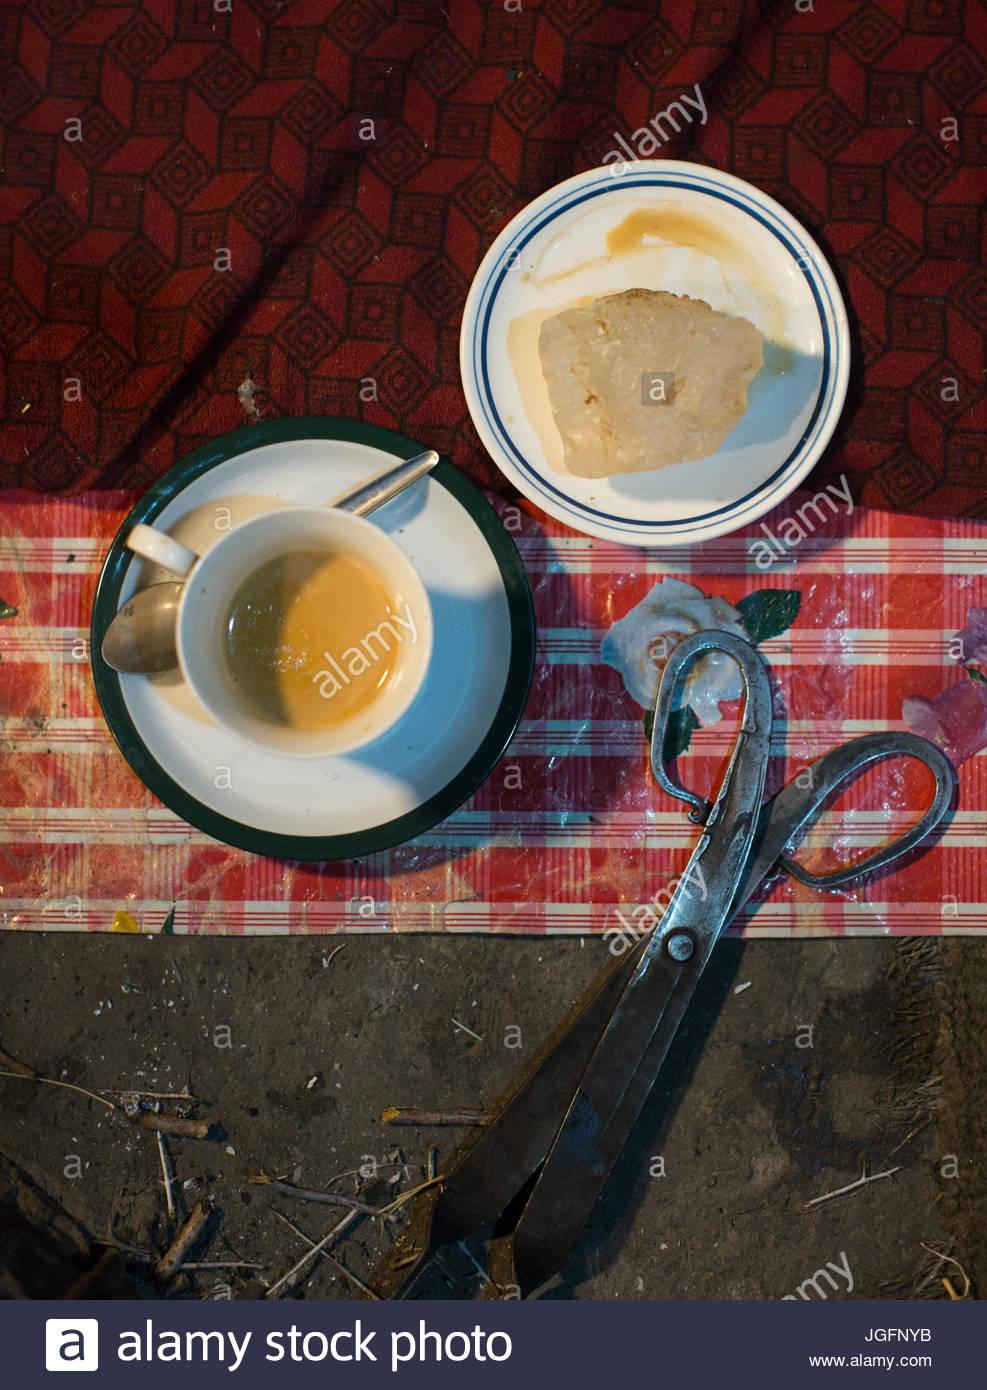 Rock salt and tea with milk. - Stock Image